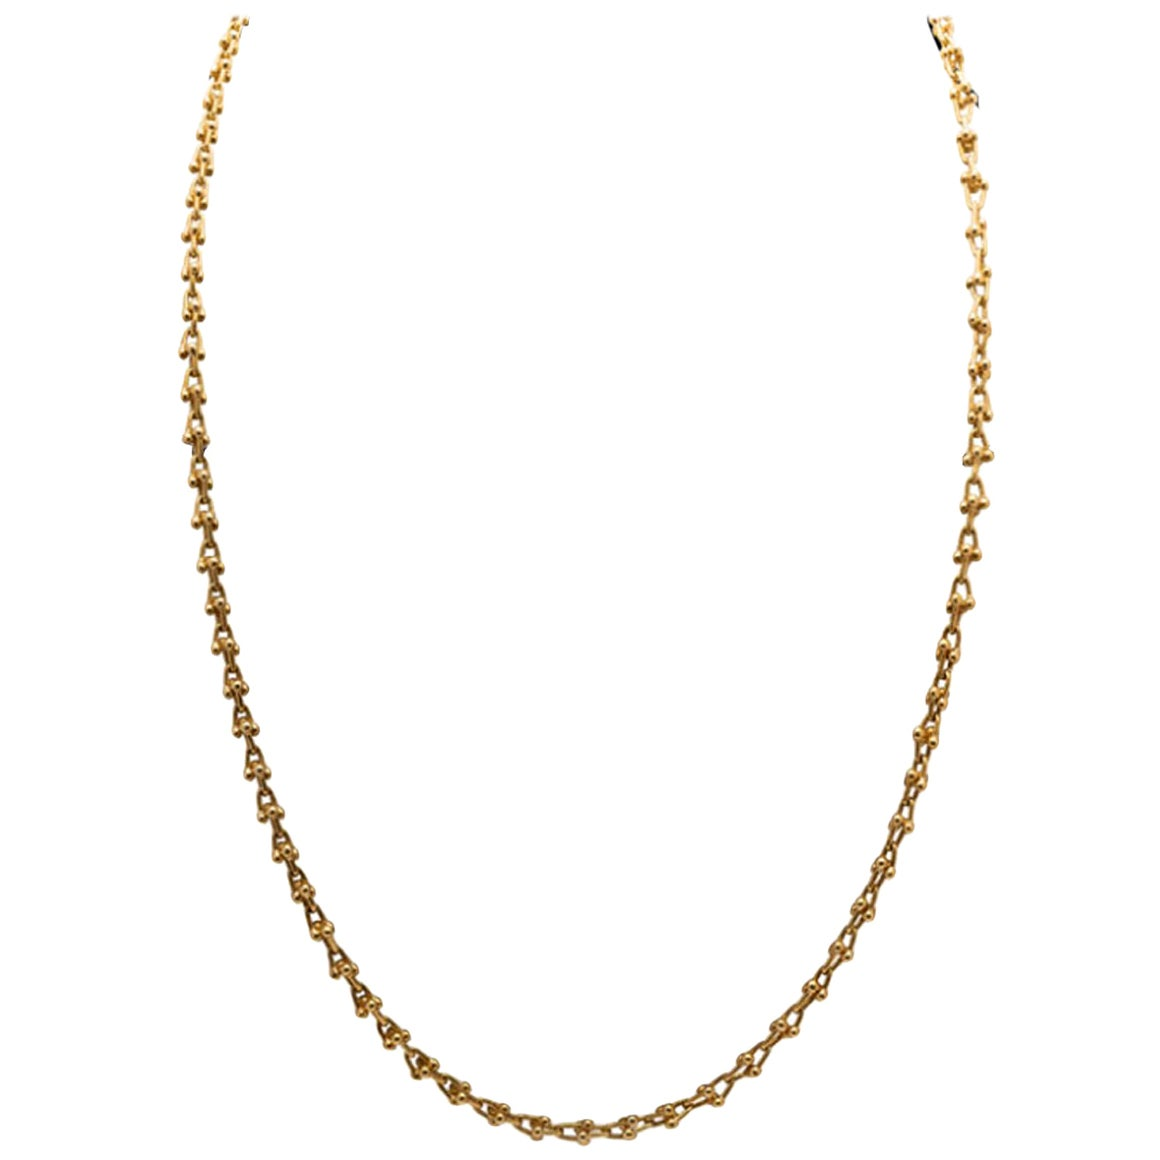 Bulgari Vintage Yellow Gold Sautoir Necklace